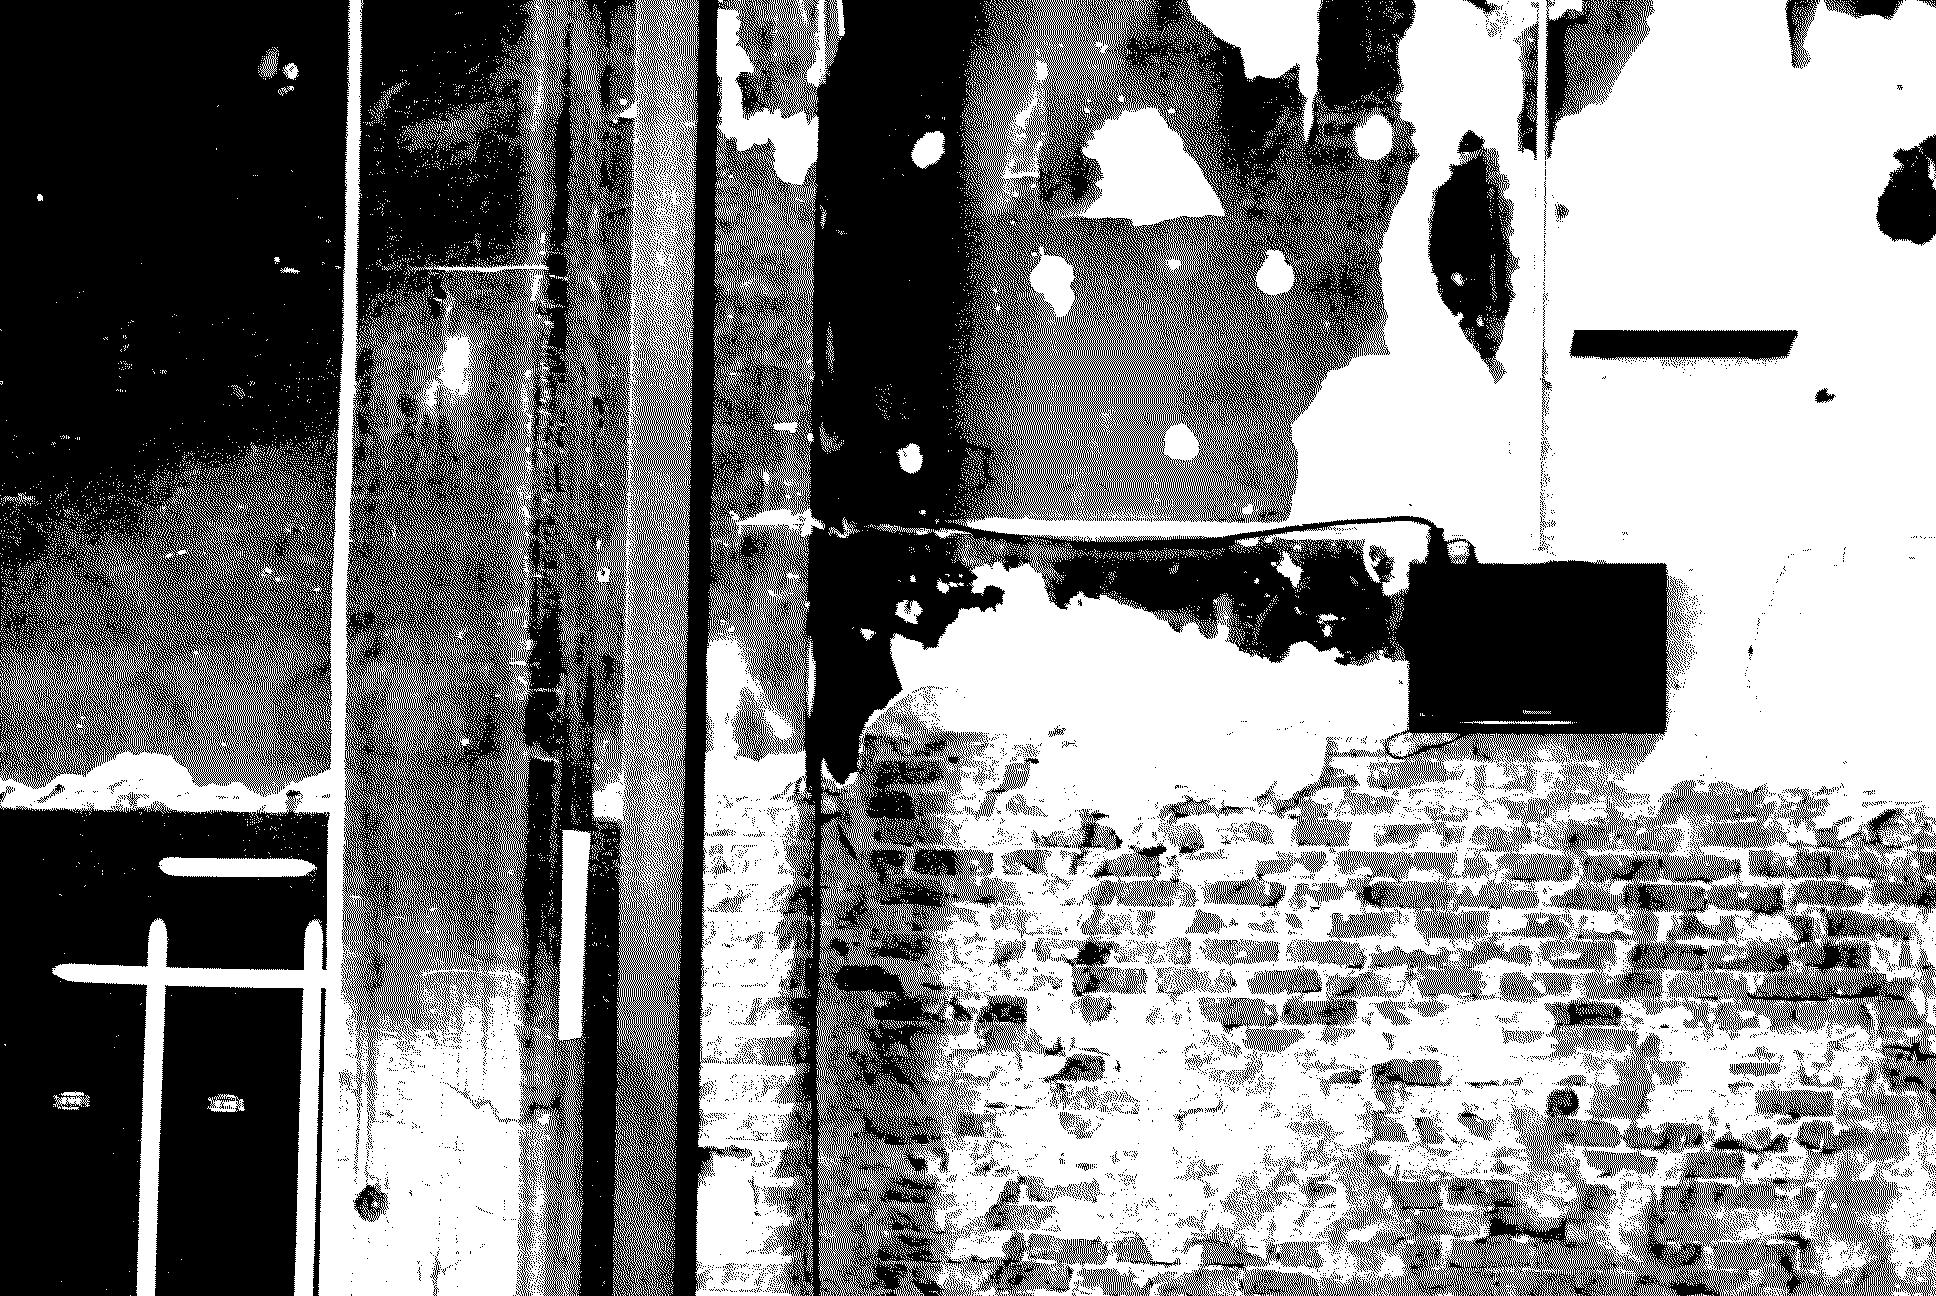 img/texturas/slaughter-wall.png